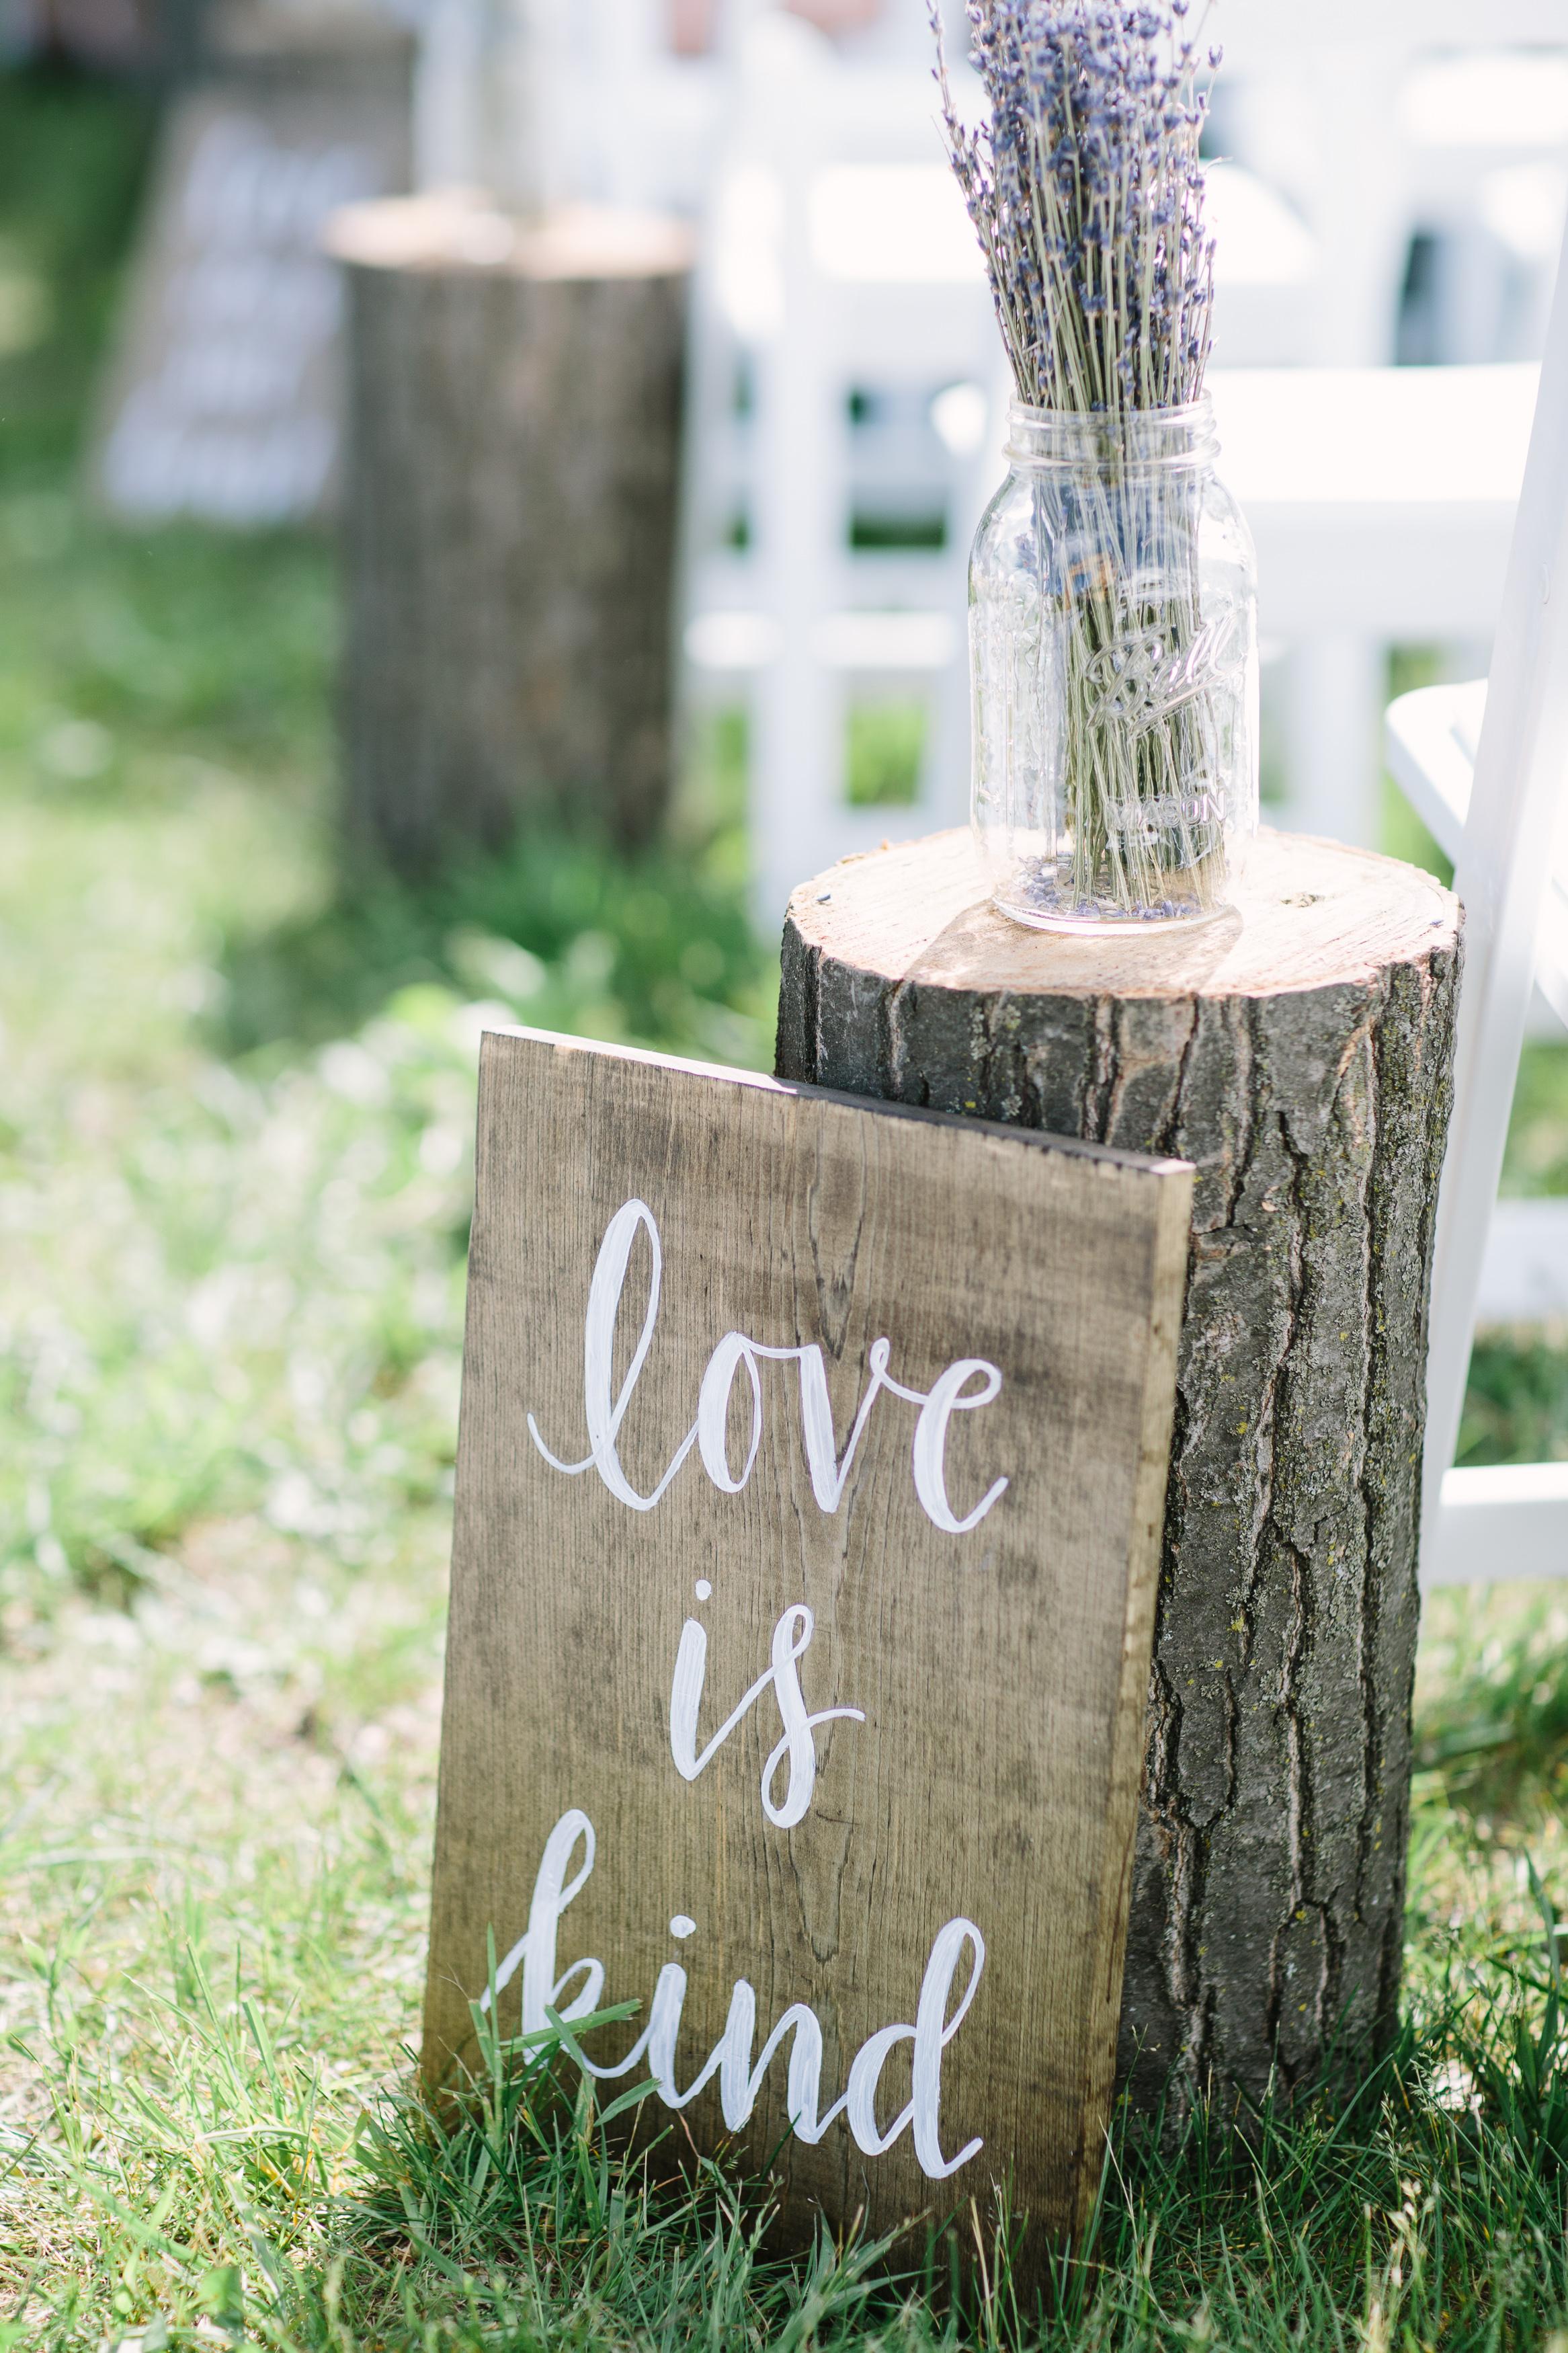 Nicodem Creative_Blog_Leung Wedding_The Pavilion at Orchad Ridge Farms_Rockton Illinois-21.jpg